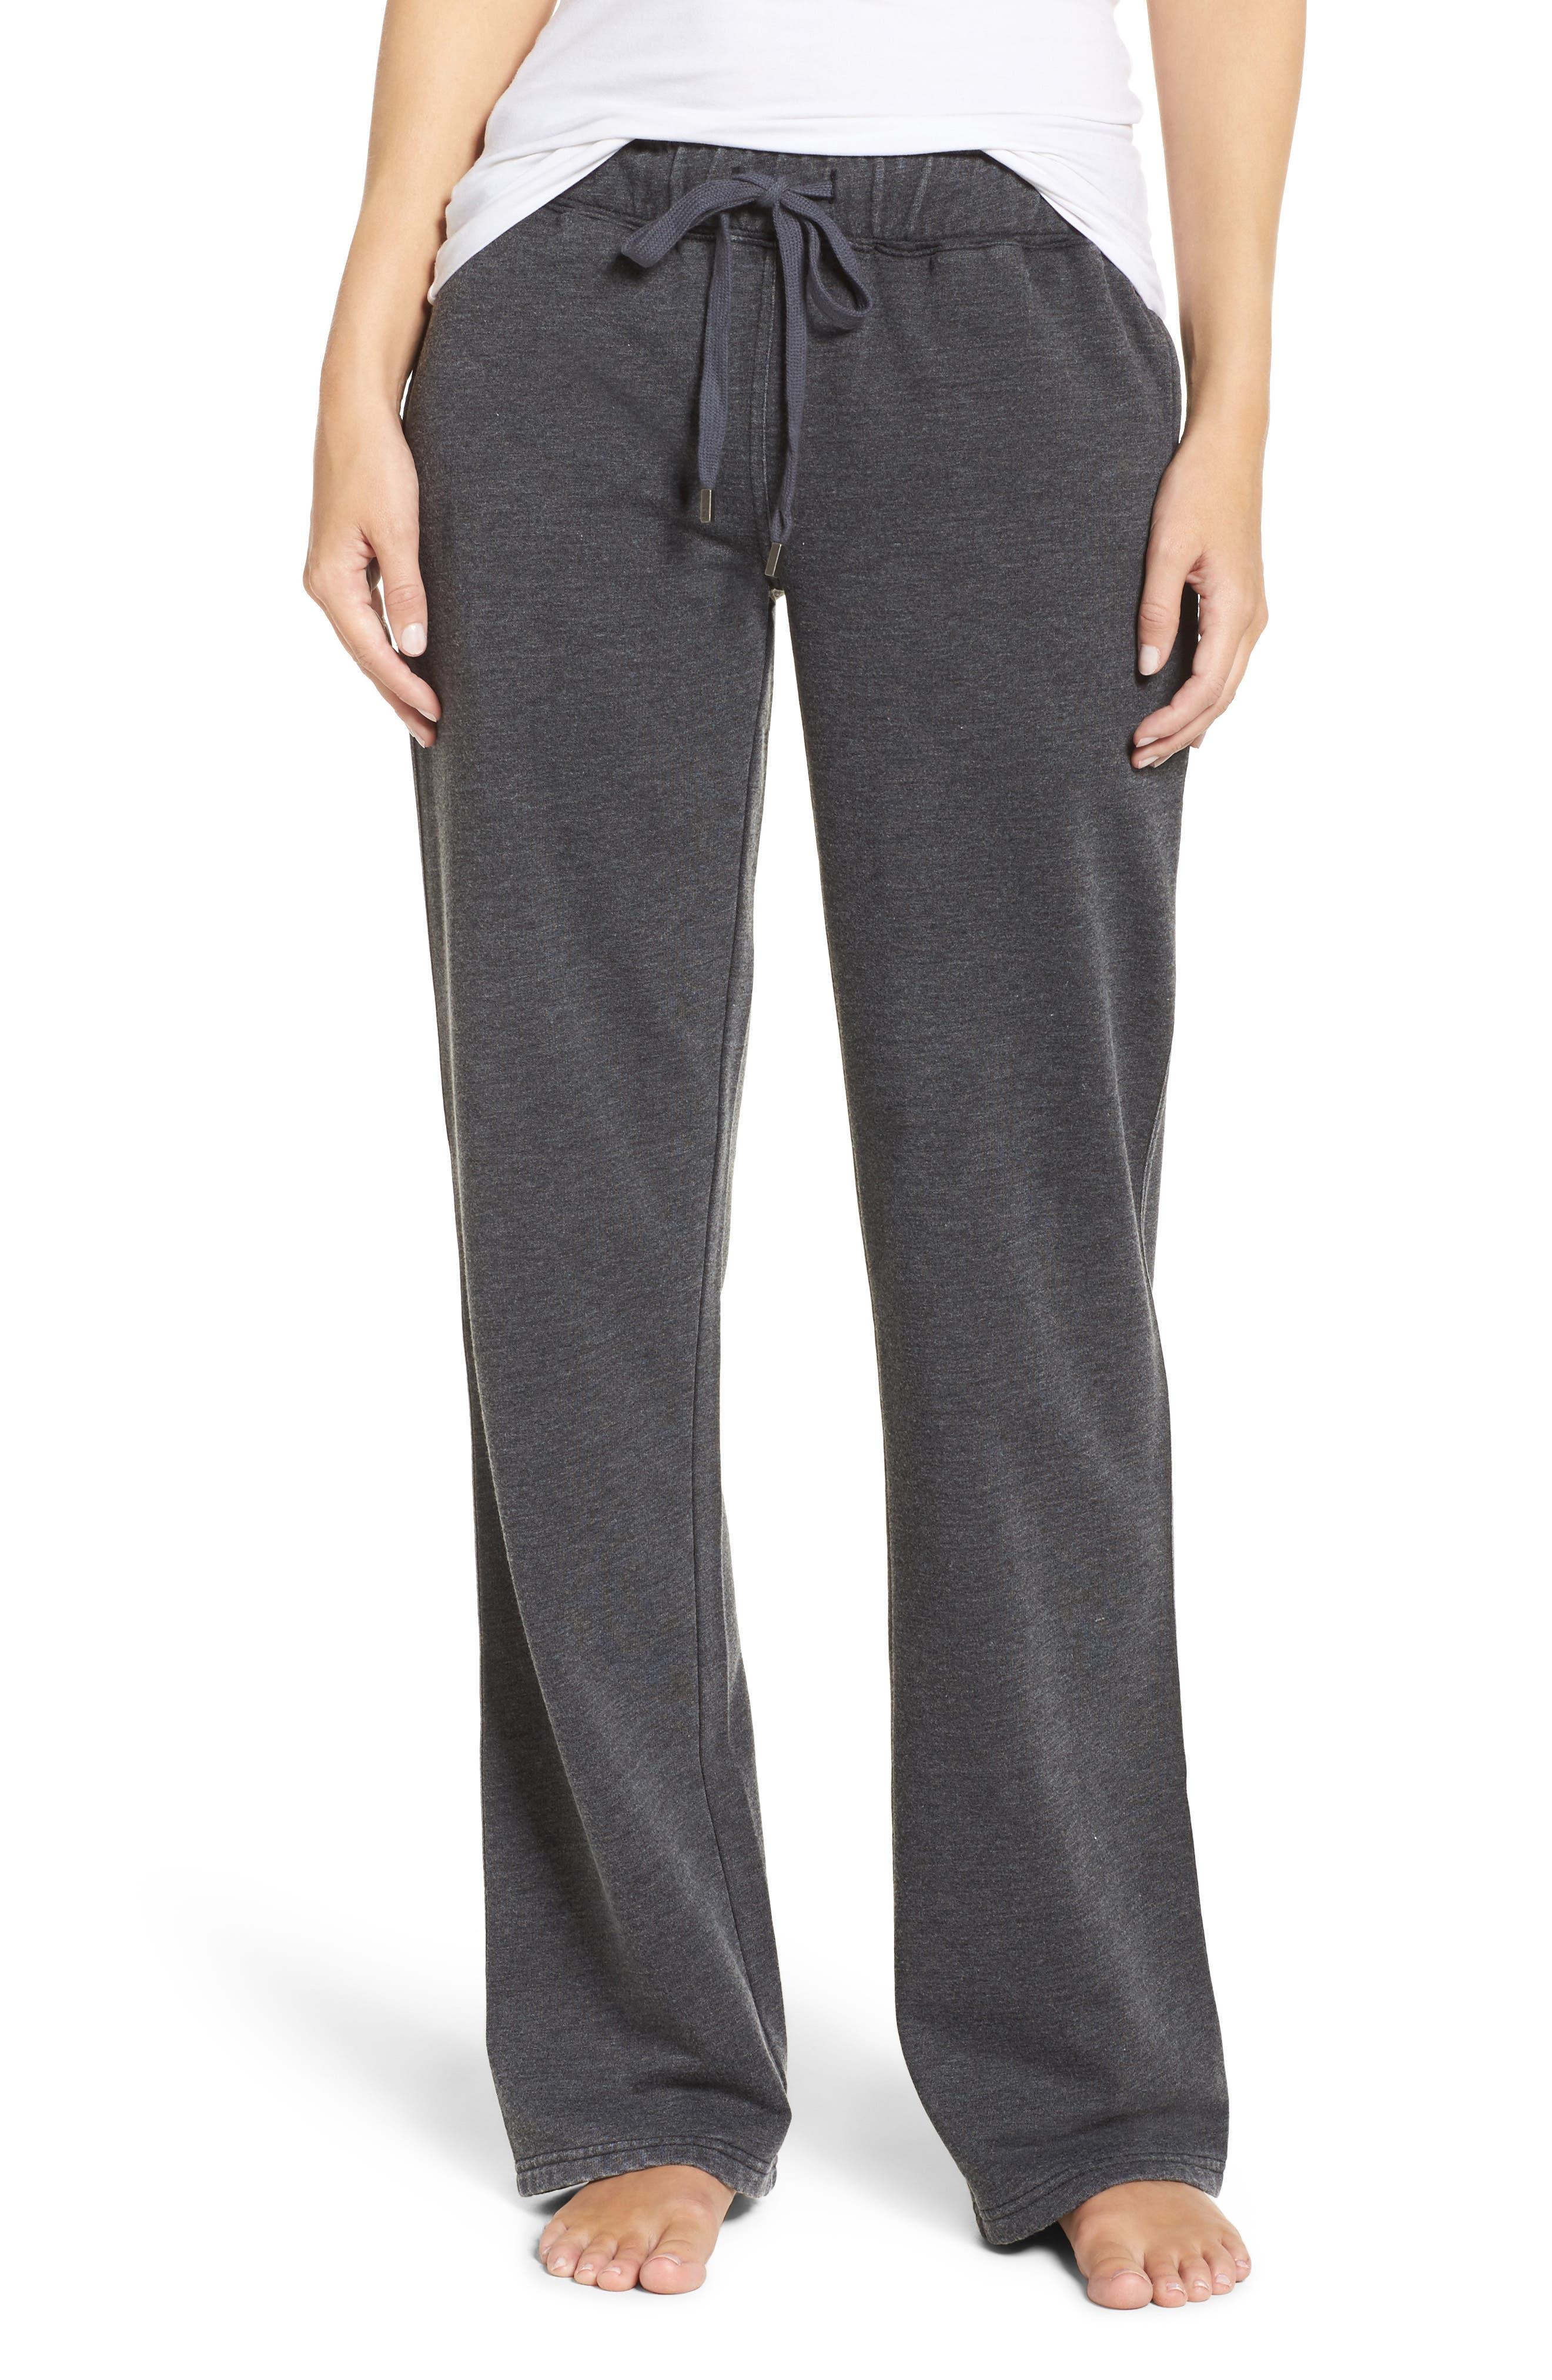 Cora Lounge Pants,                         Main,                         color, Charcoal